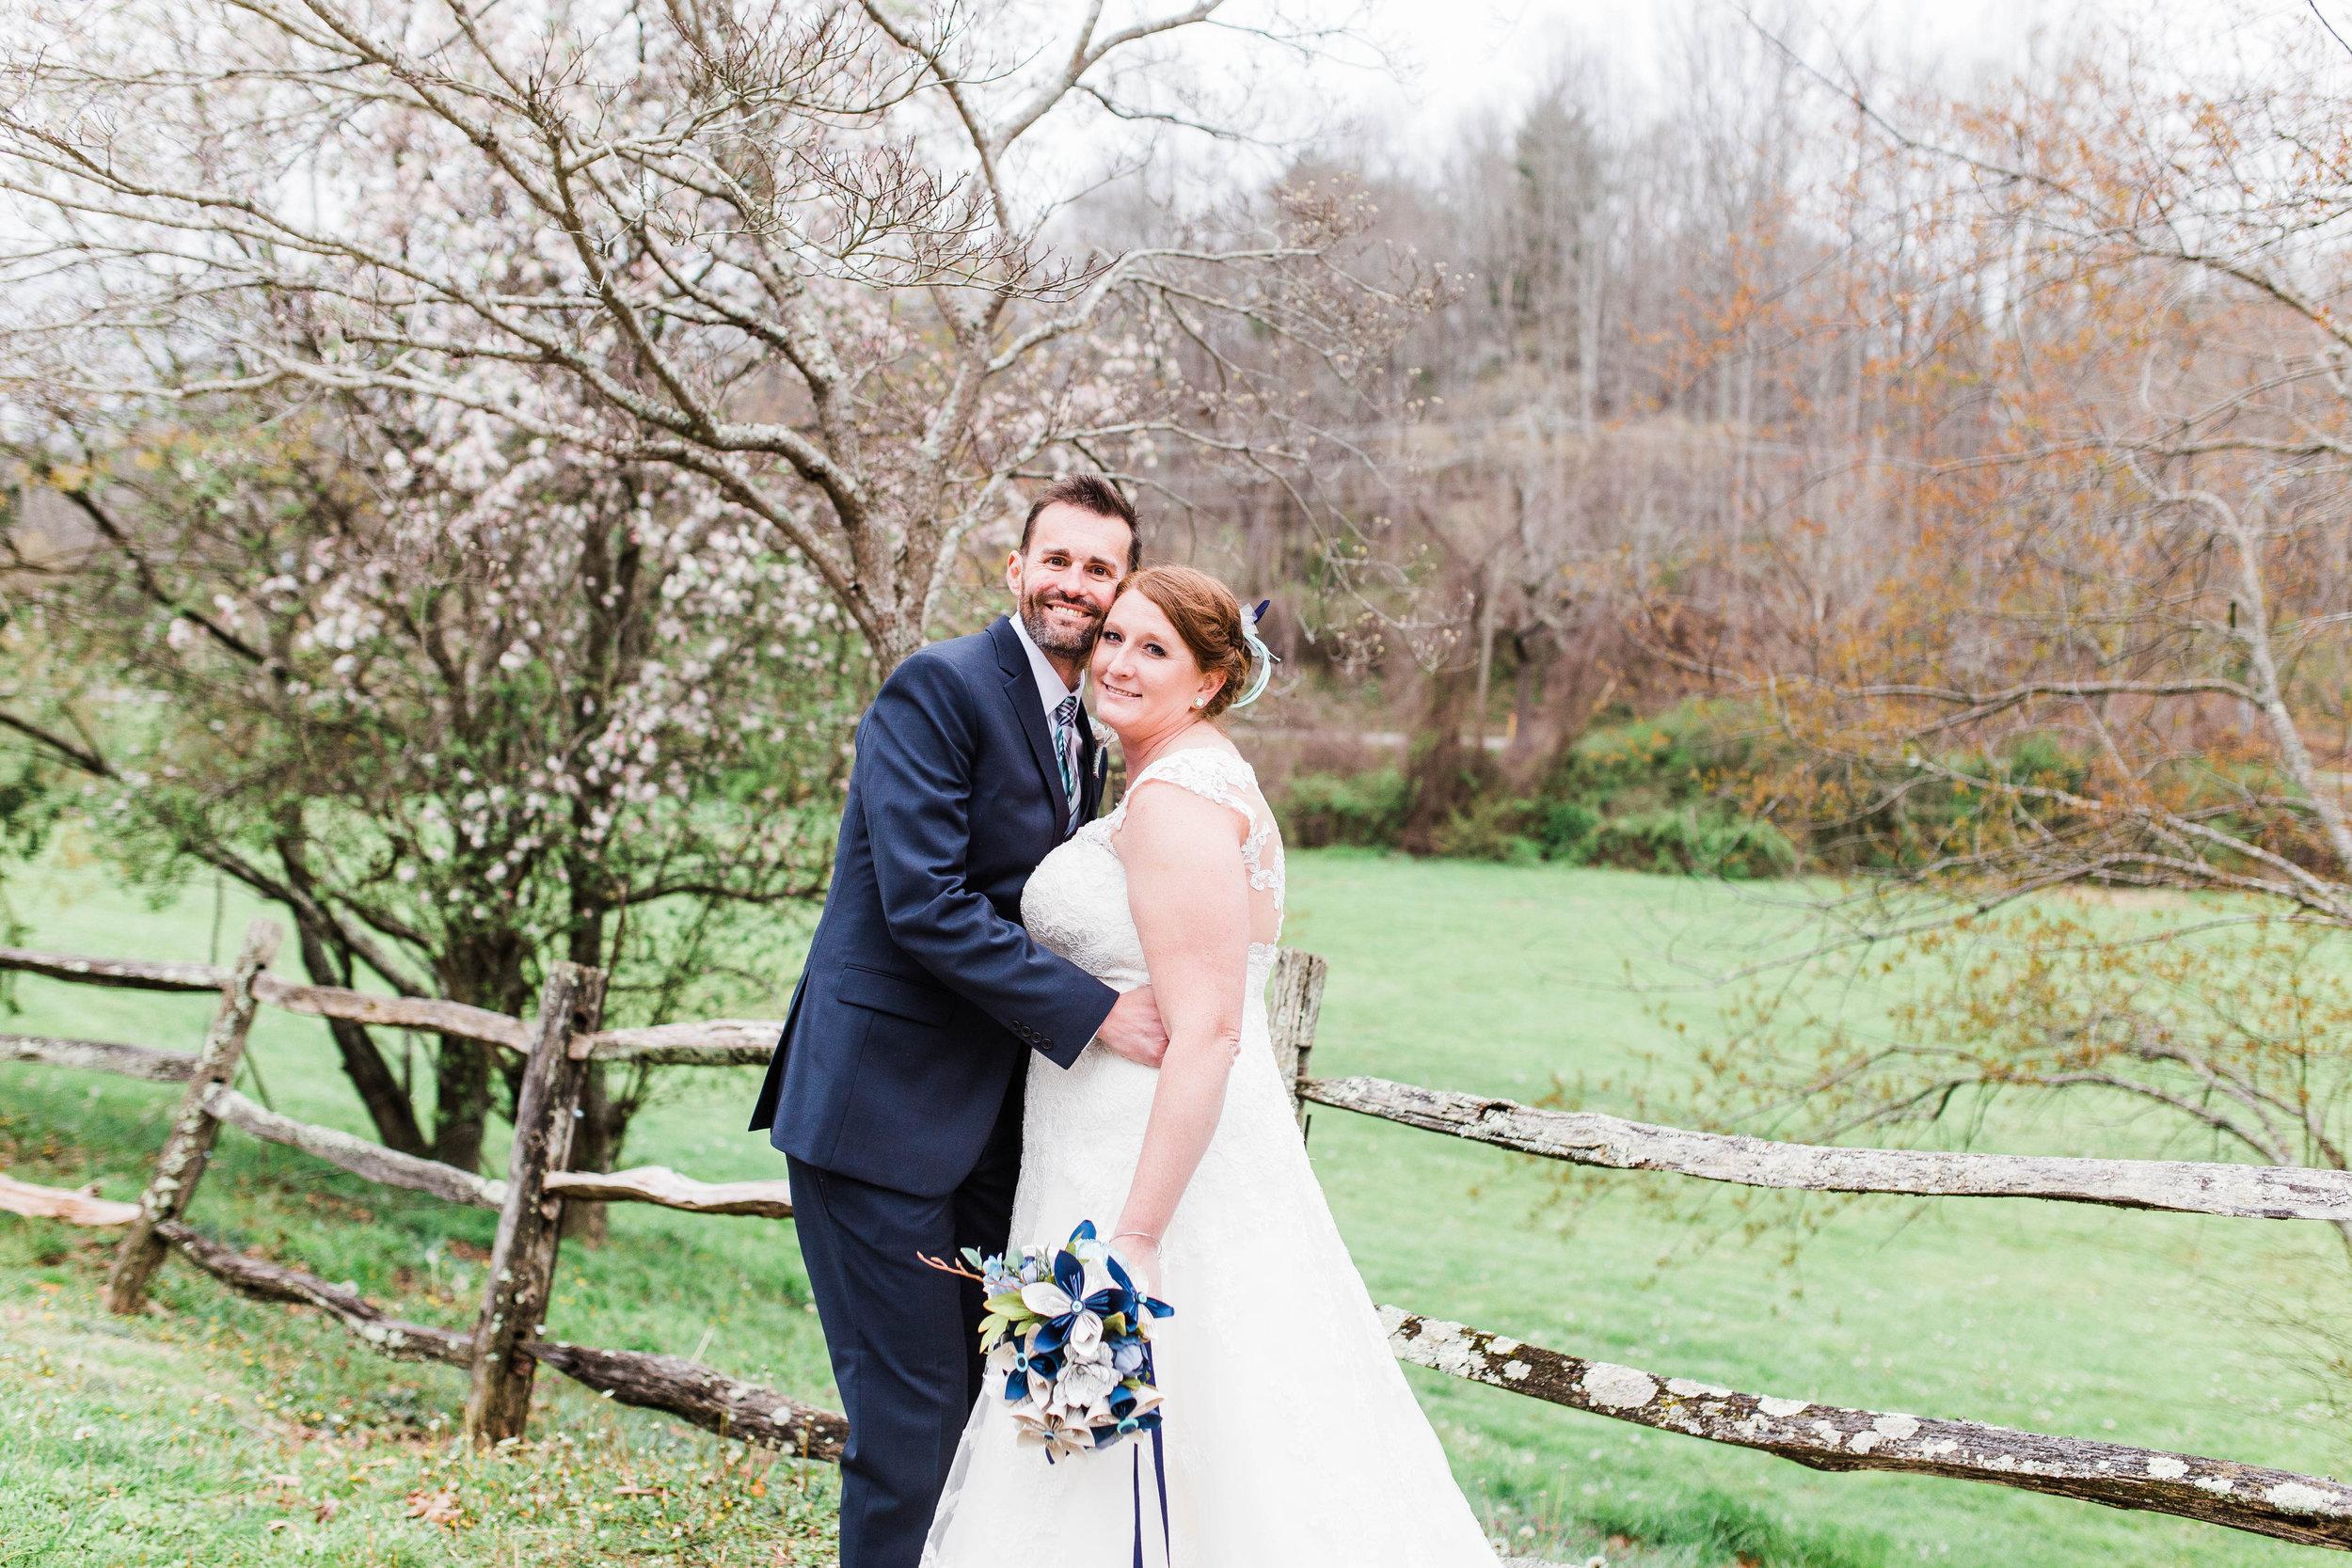 Honeysuckle-Hill-Weddings-Andrew-Rachel-108.jpg